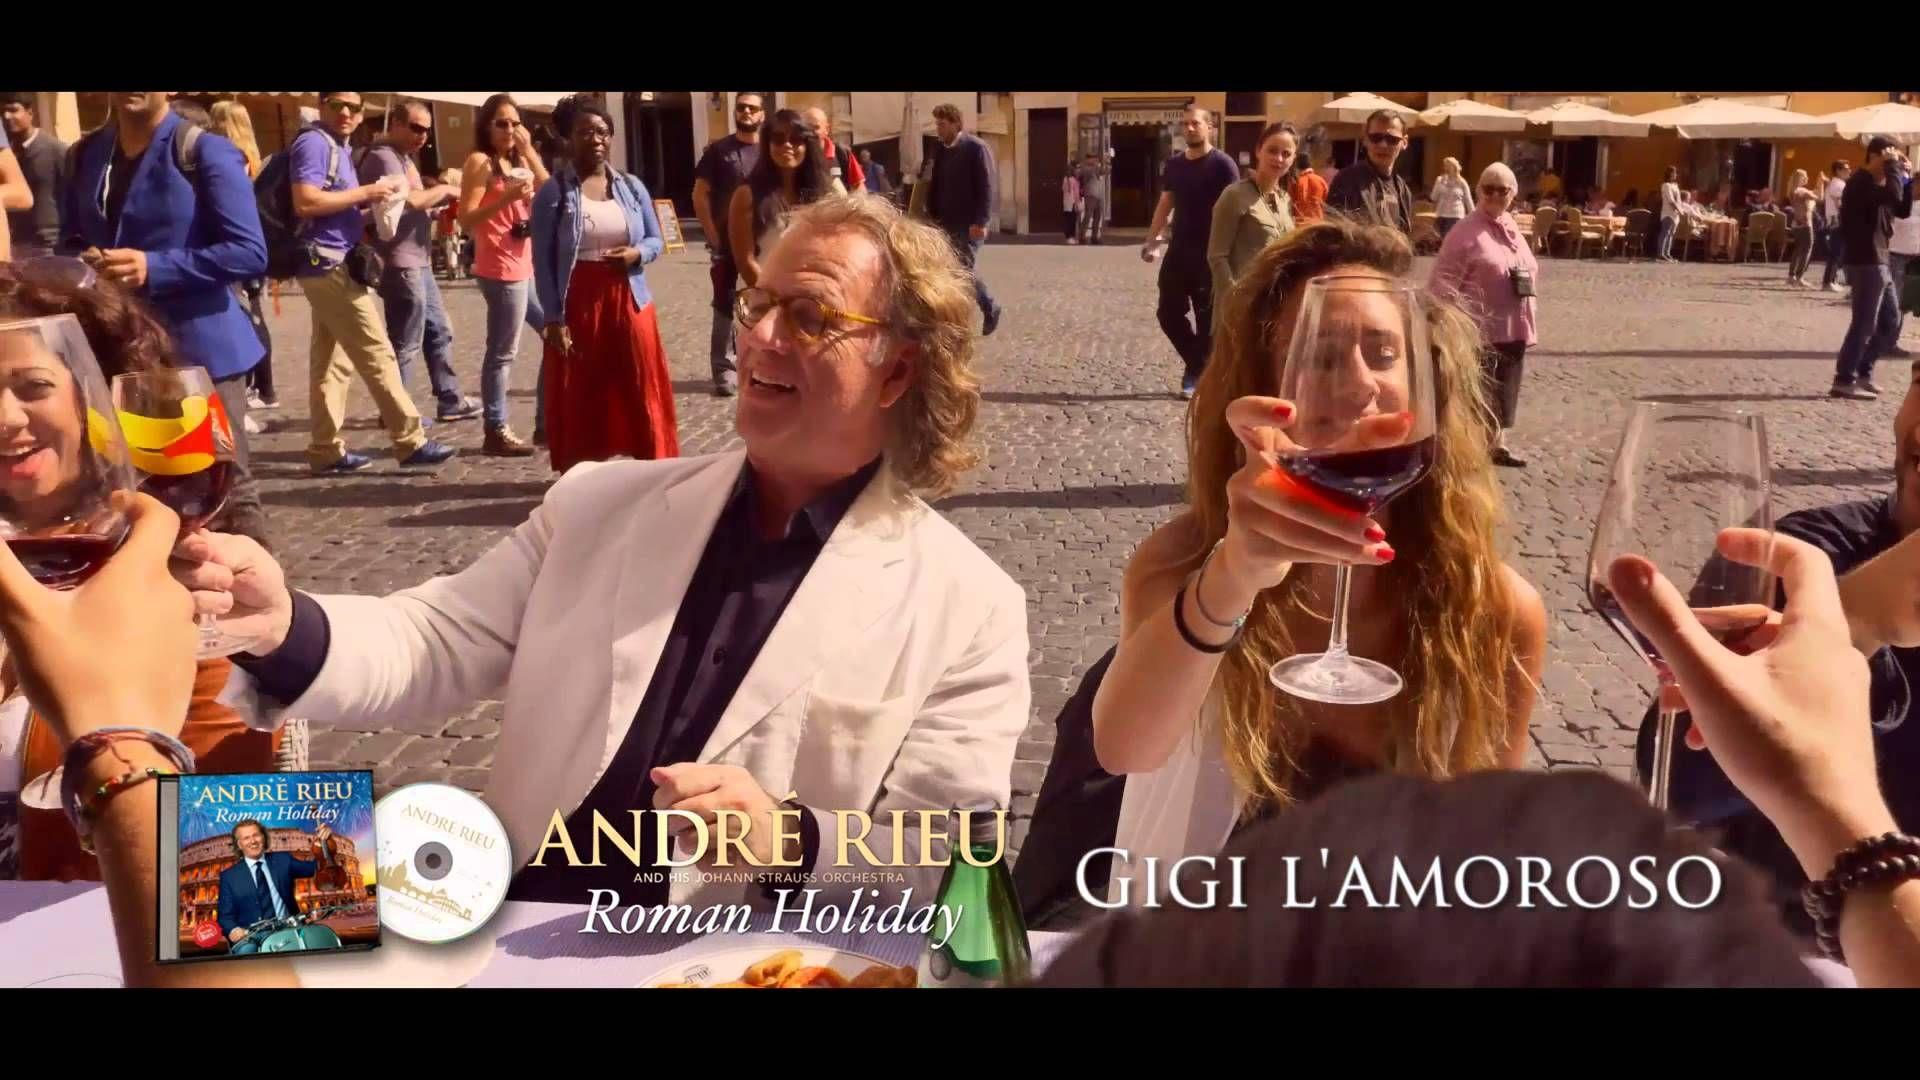 André Rieu about Gigi's love > André Rieu zu Gigi's Liebe